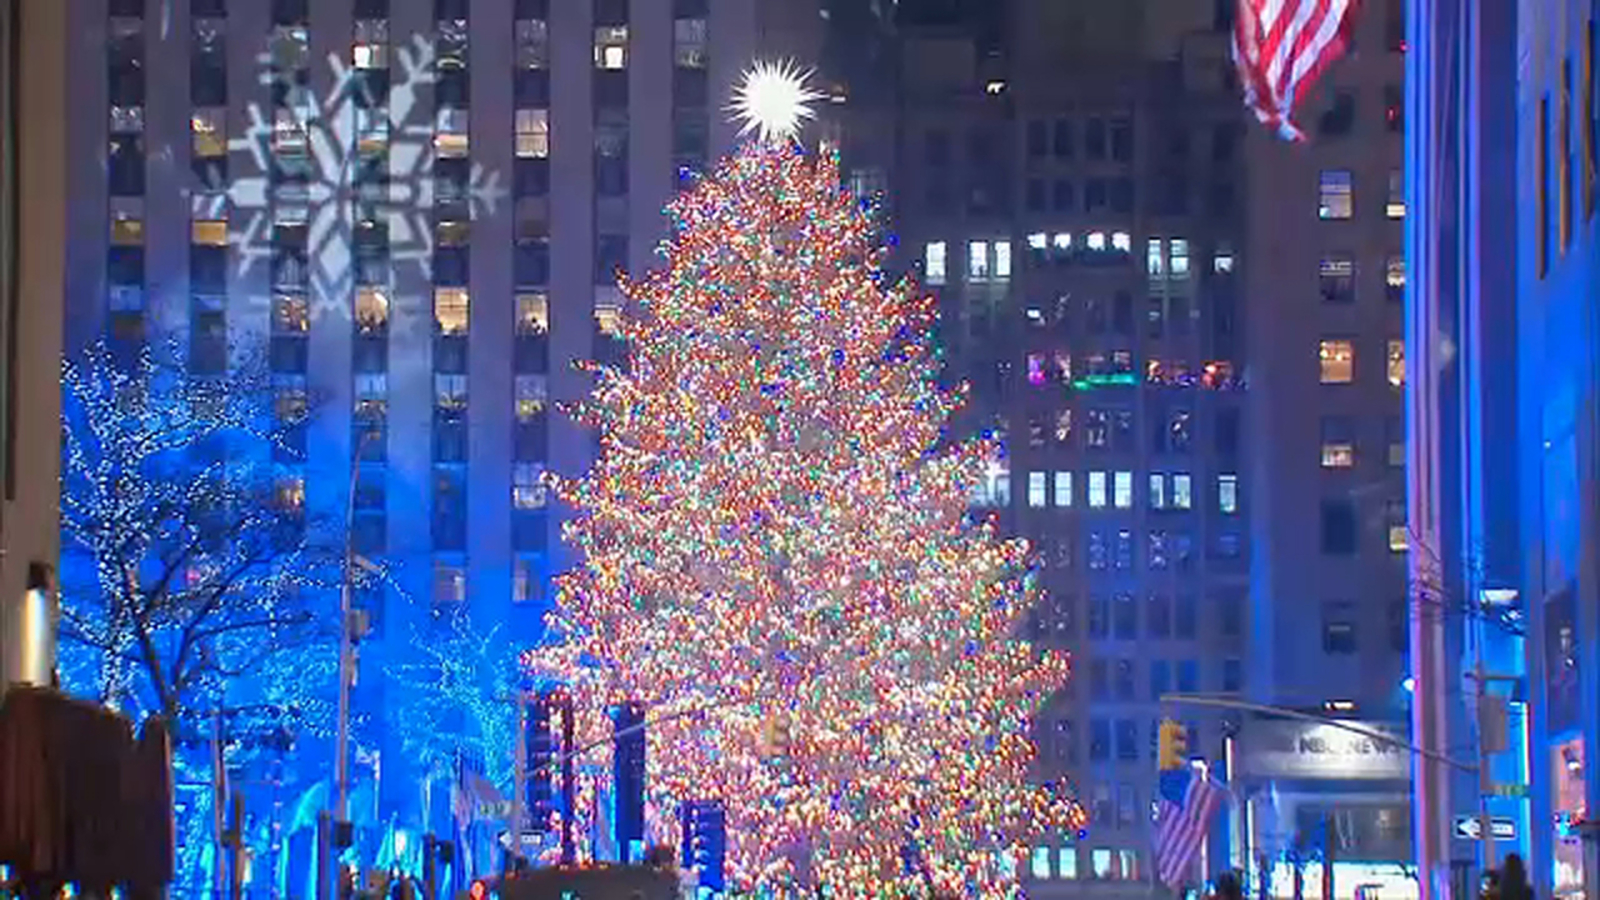 Rockefeller Center Christmas Tree lighting ceremony held - ABC7 New York